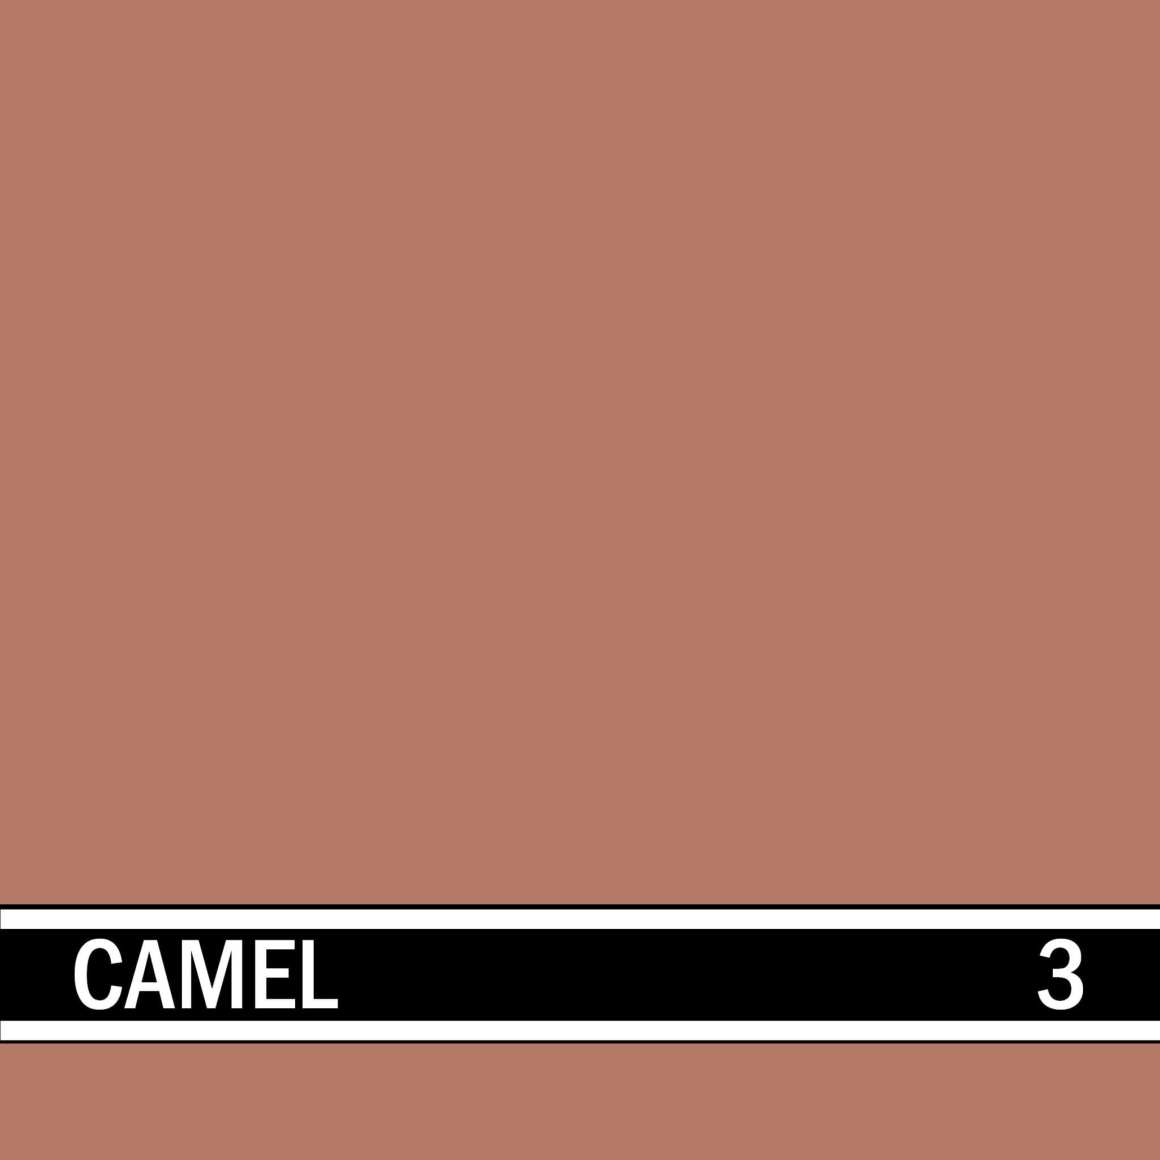 Camel integral concrete color for stamped concrete and decorative colored concrete